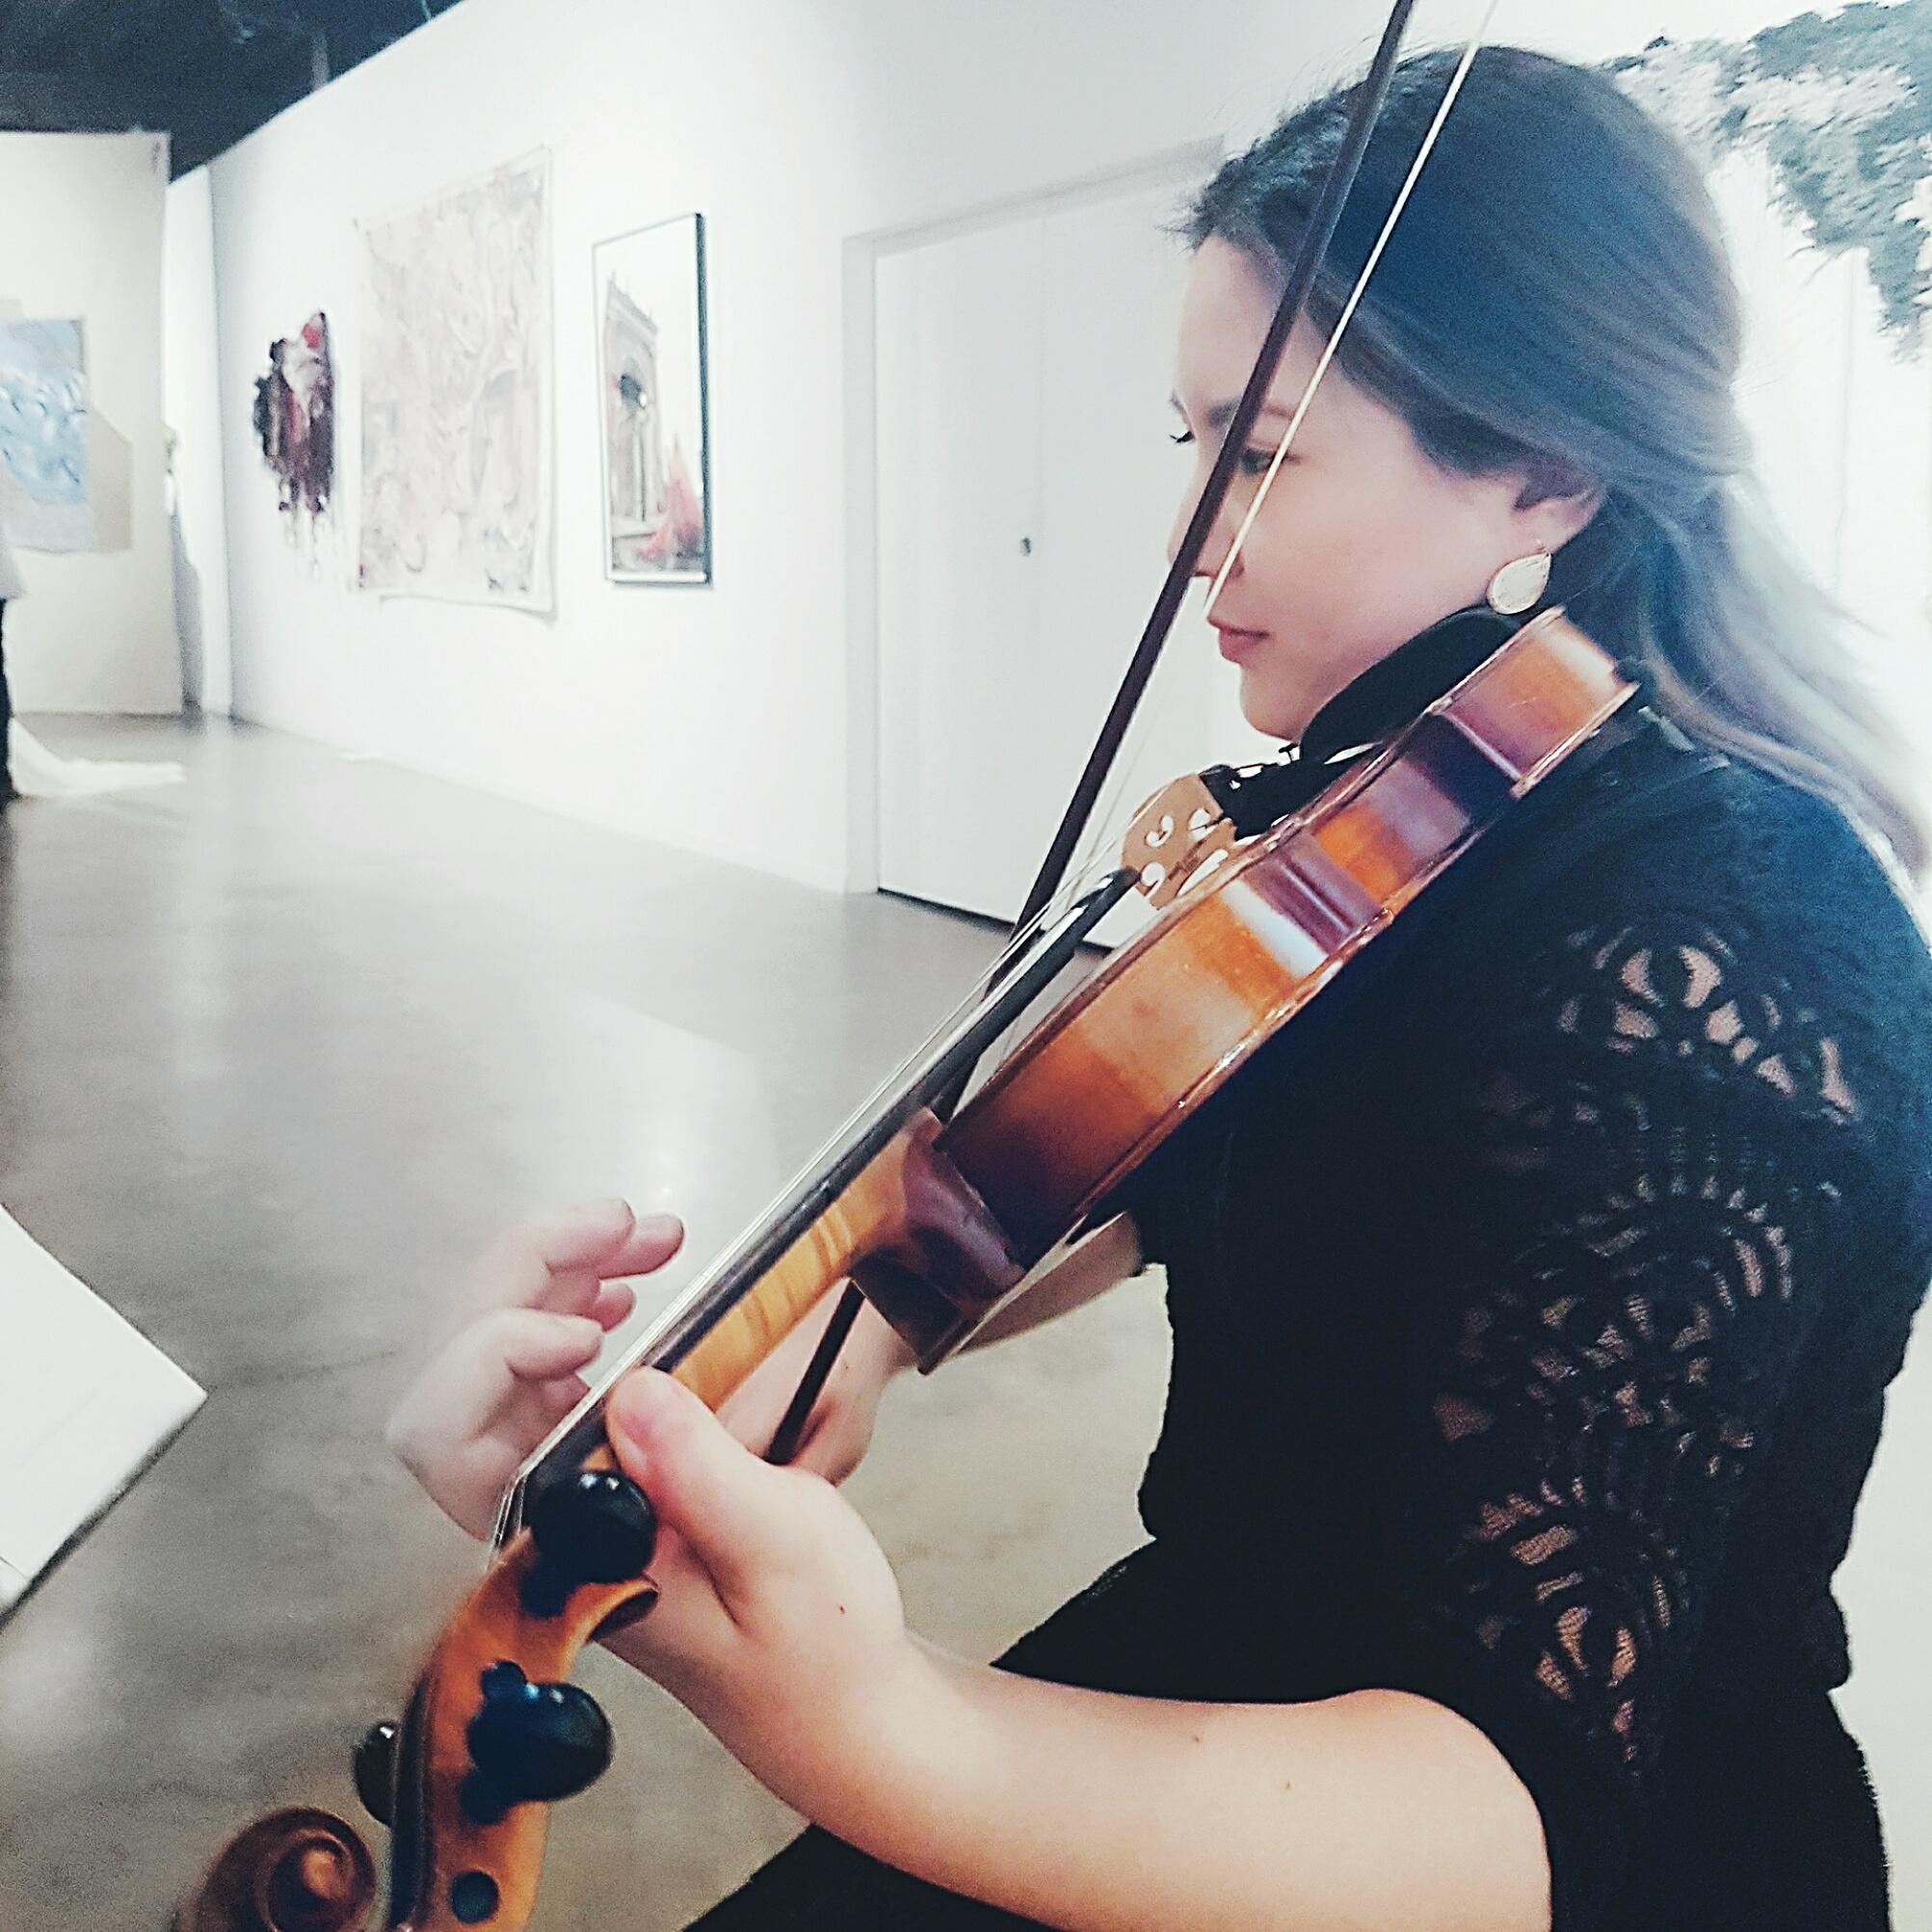 perth-function-string-music-hire-wedding-riverside-musiciansperth-function-string-music-hire-wedding-riverside-musicians-classical-contemporary-violin-violinist-event-art